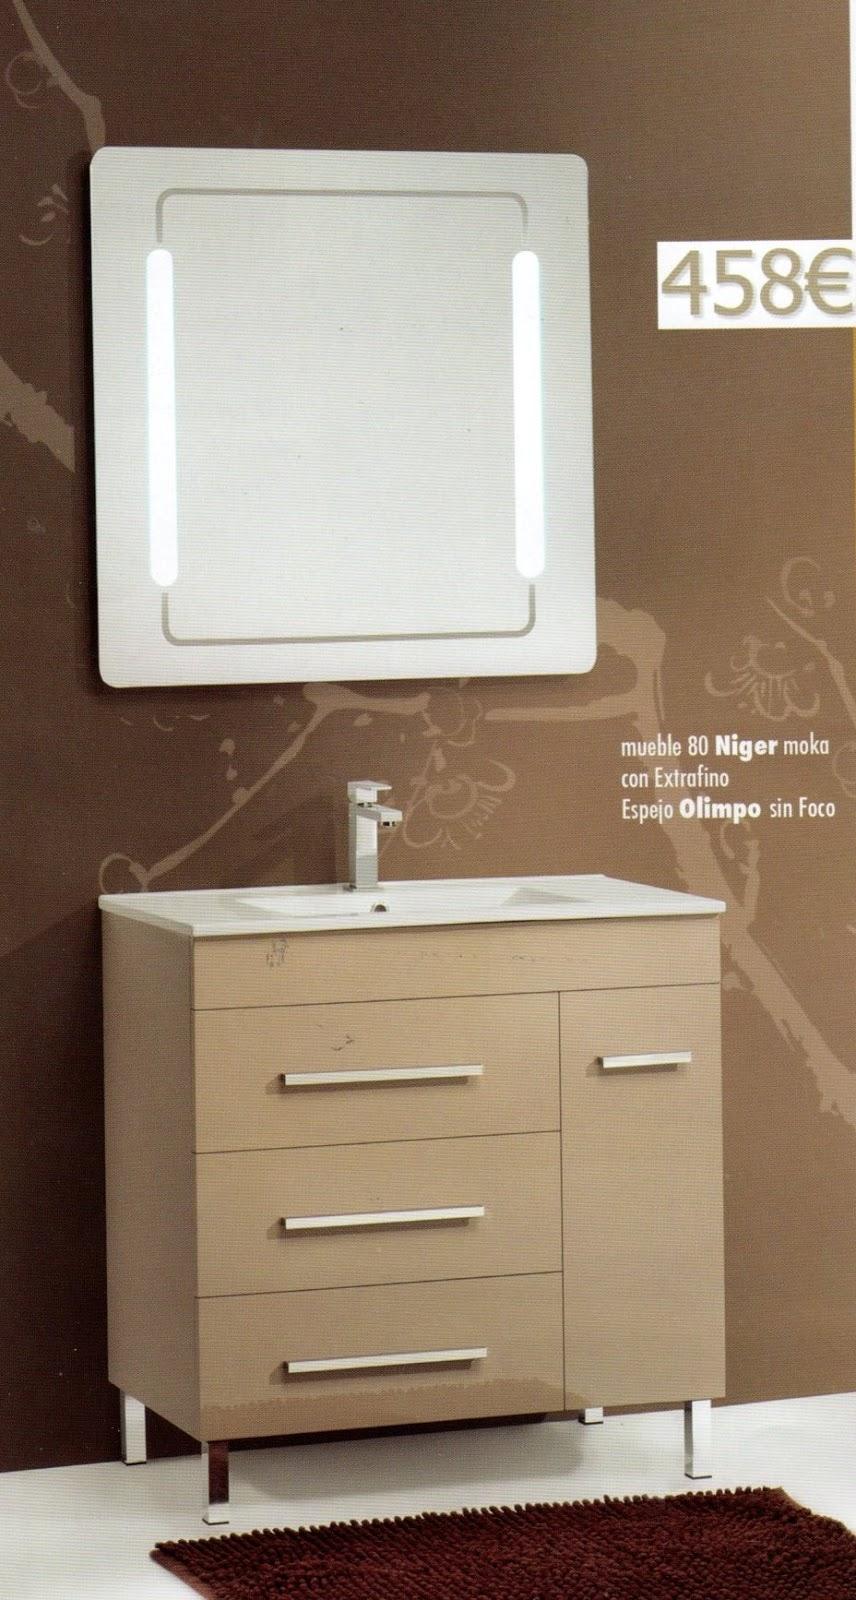 Maringlass Aluminio Vidrio Muebles De Ba O Super Ofertas